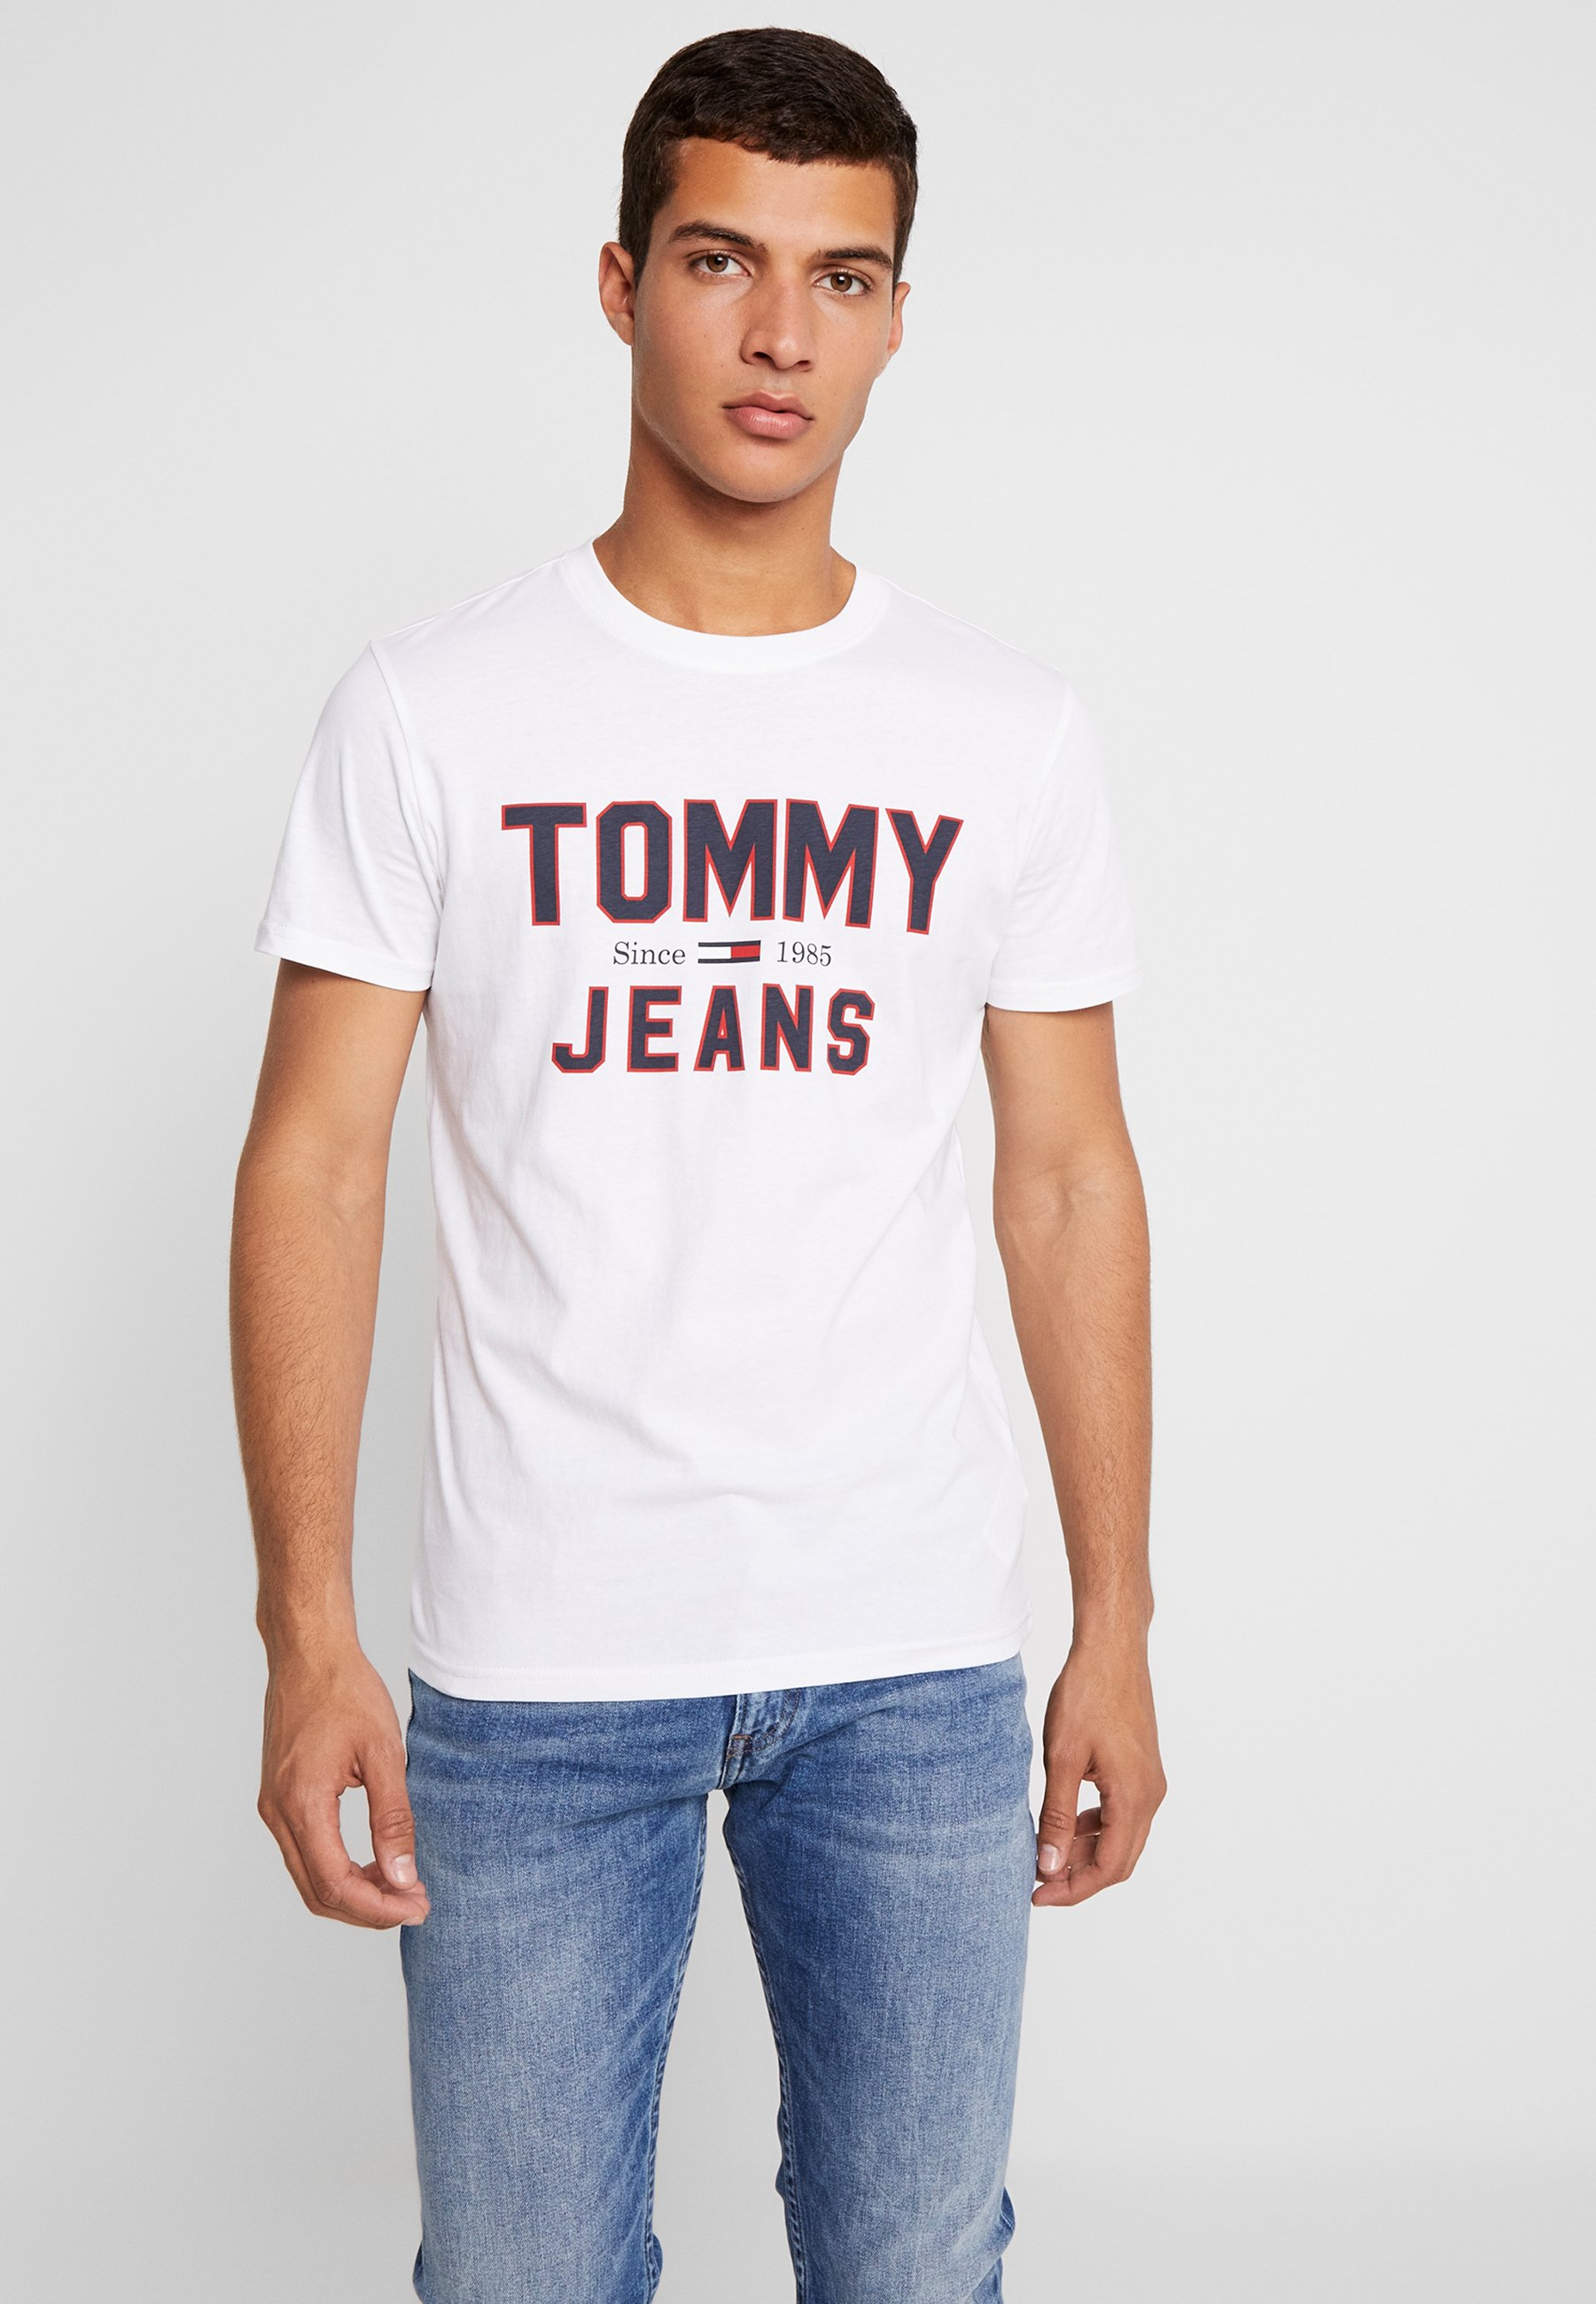 Classic Imprimé 1985 Jeans Logo TeeT shirt Tommy White Essential Yfy6bv7g